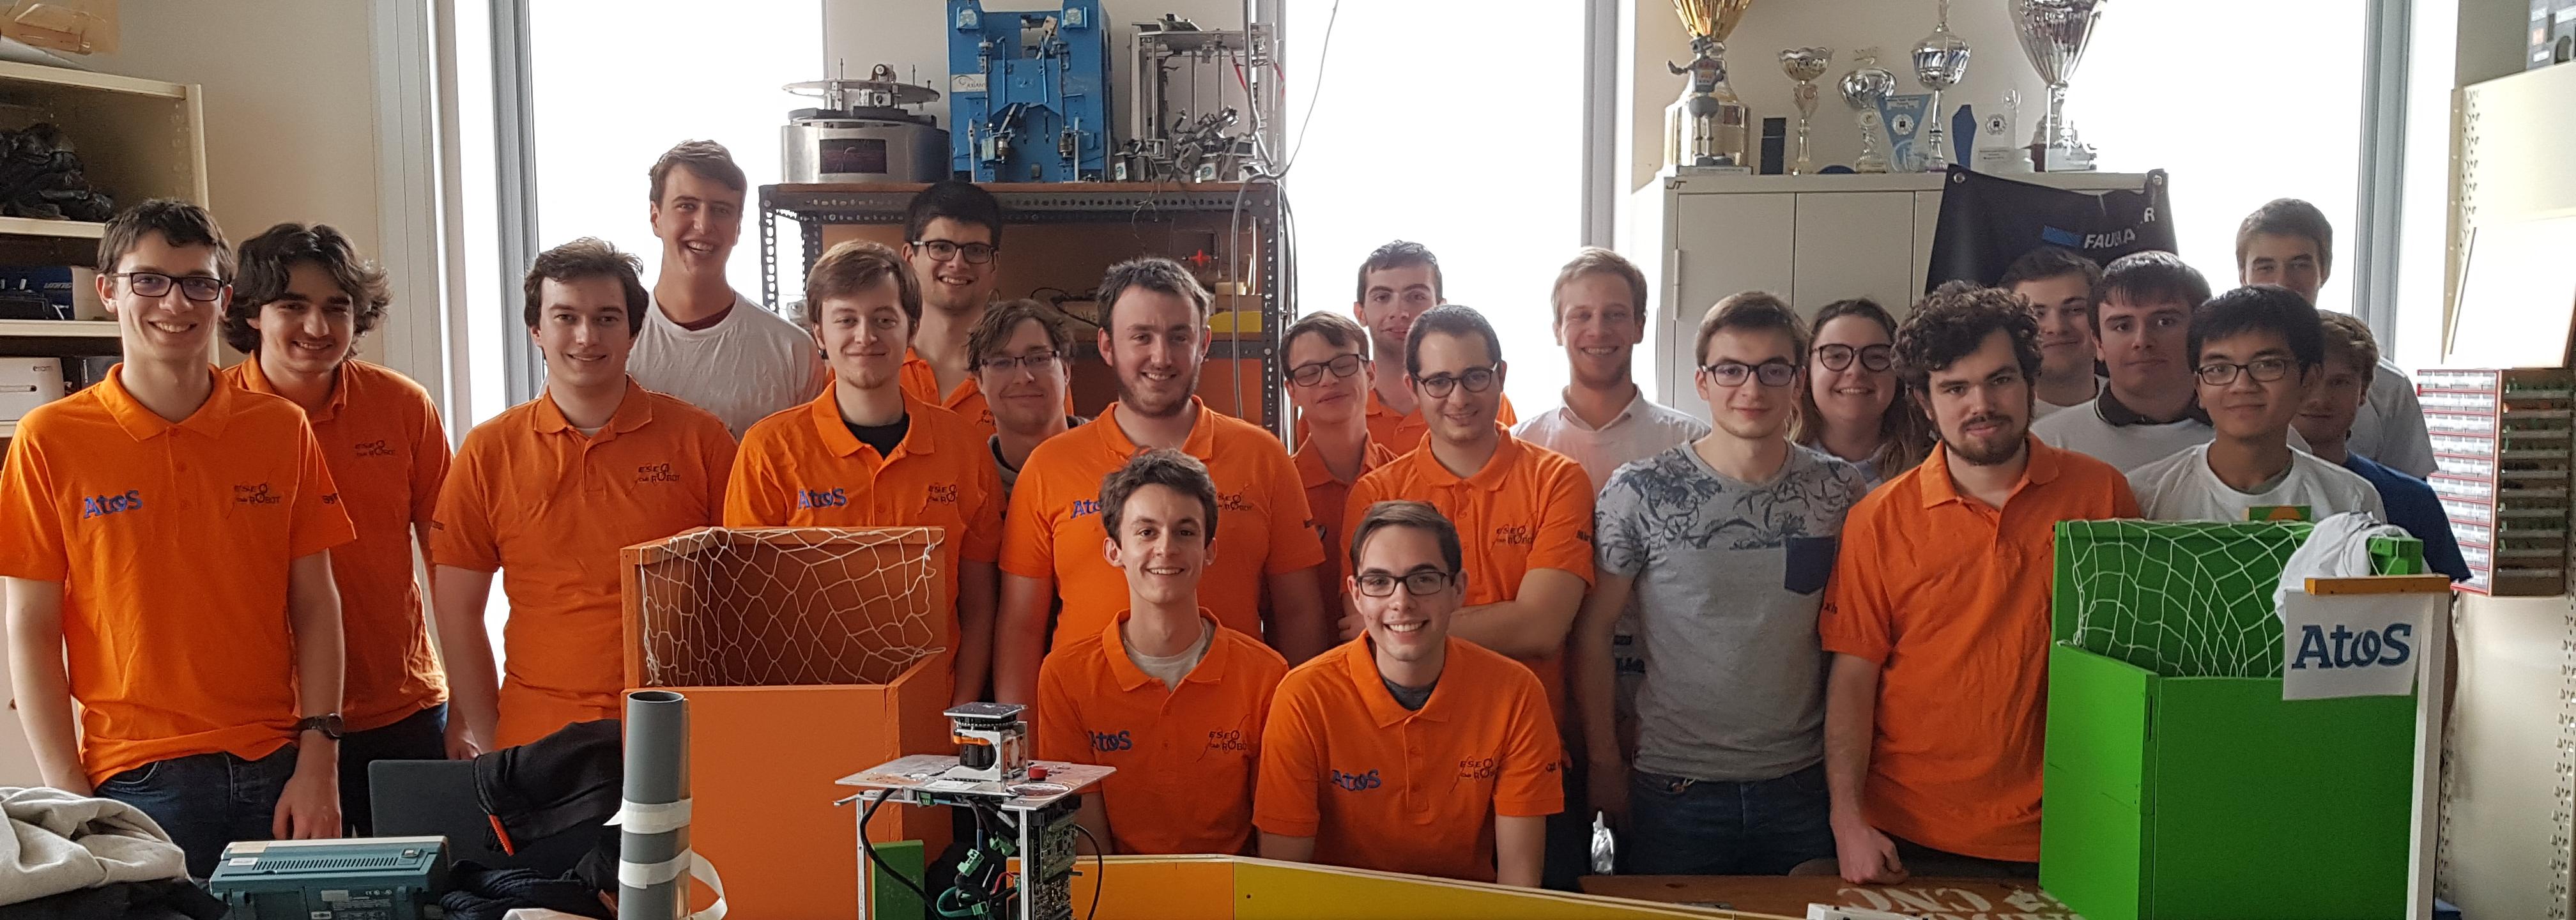 L'équipe Robot ESEO 2017-2018